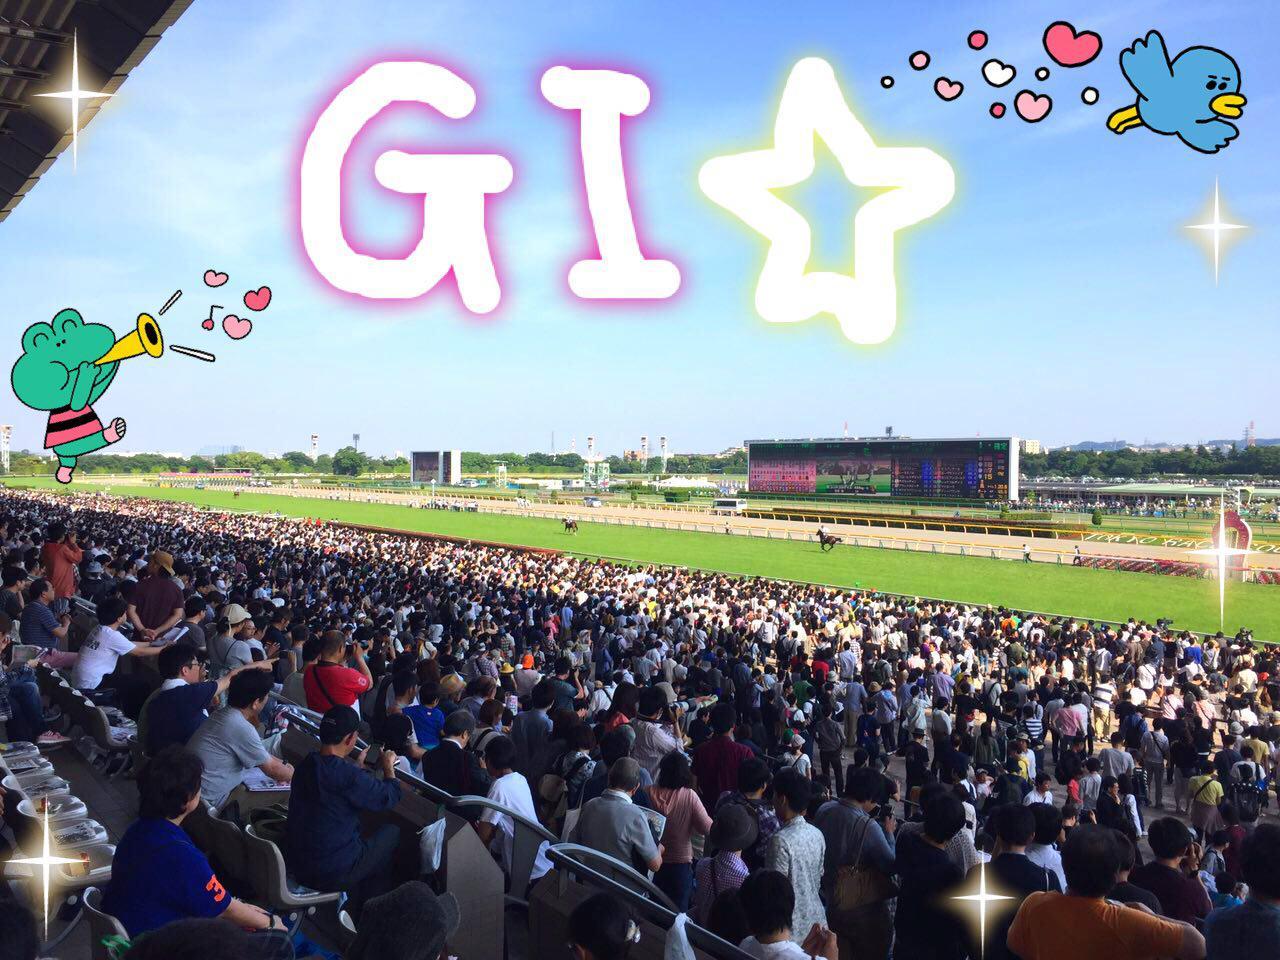 photo_2017-05-21_21-48-13.jpg